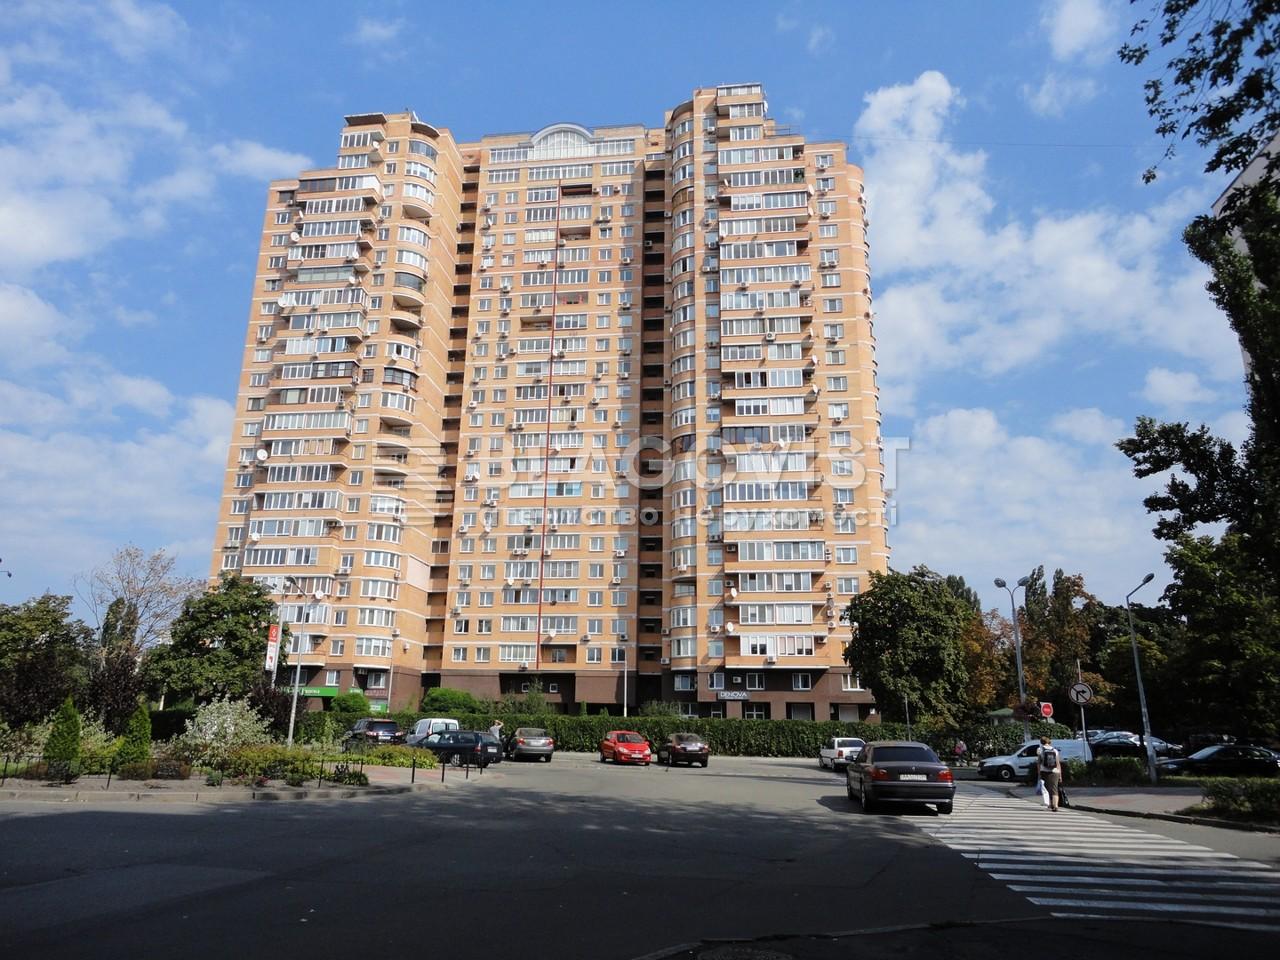 Квартира A-110655, Шамо Игоря бул. (Давыдова А. бул.), 12, Киев - Фото 2